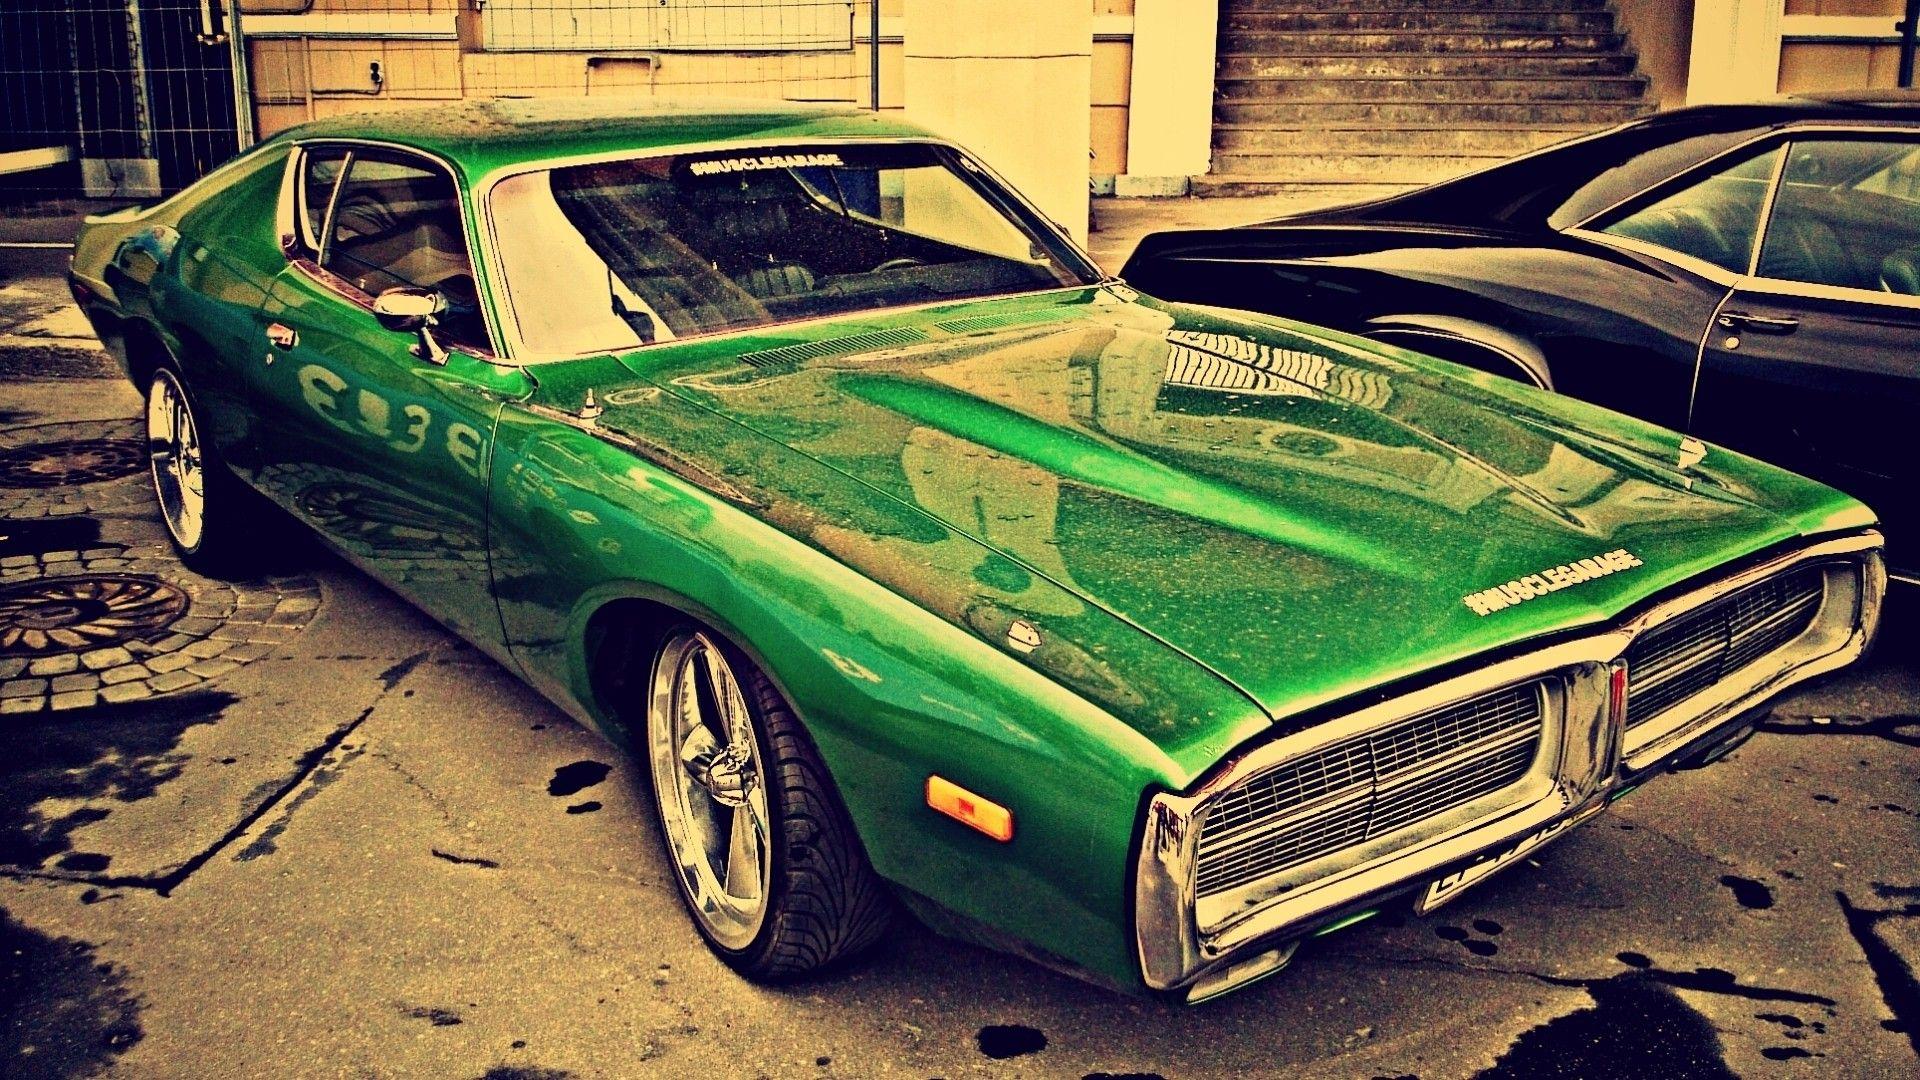 Vintage Car Car Green Cars Wallpaper Car Cars Dodge